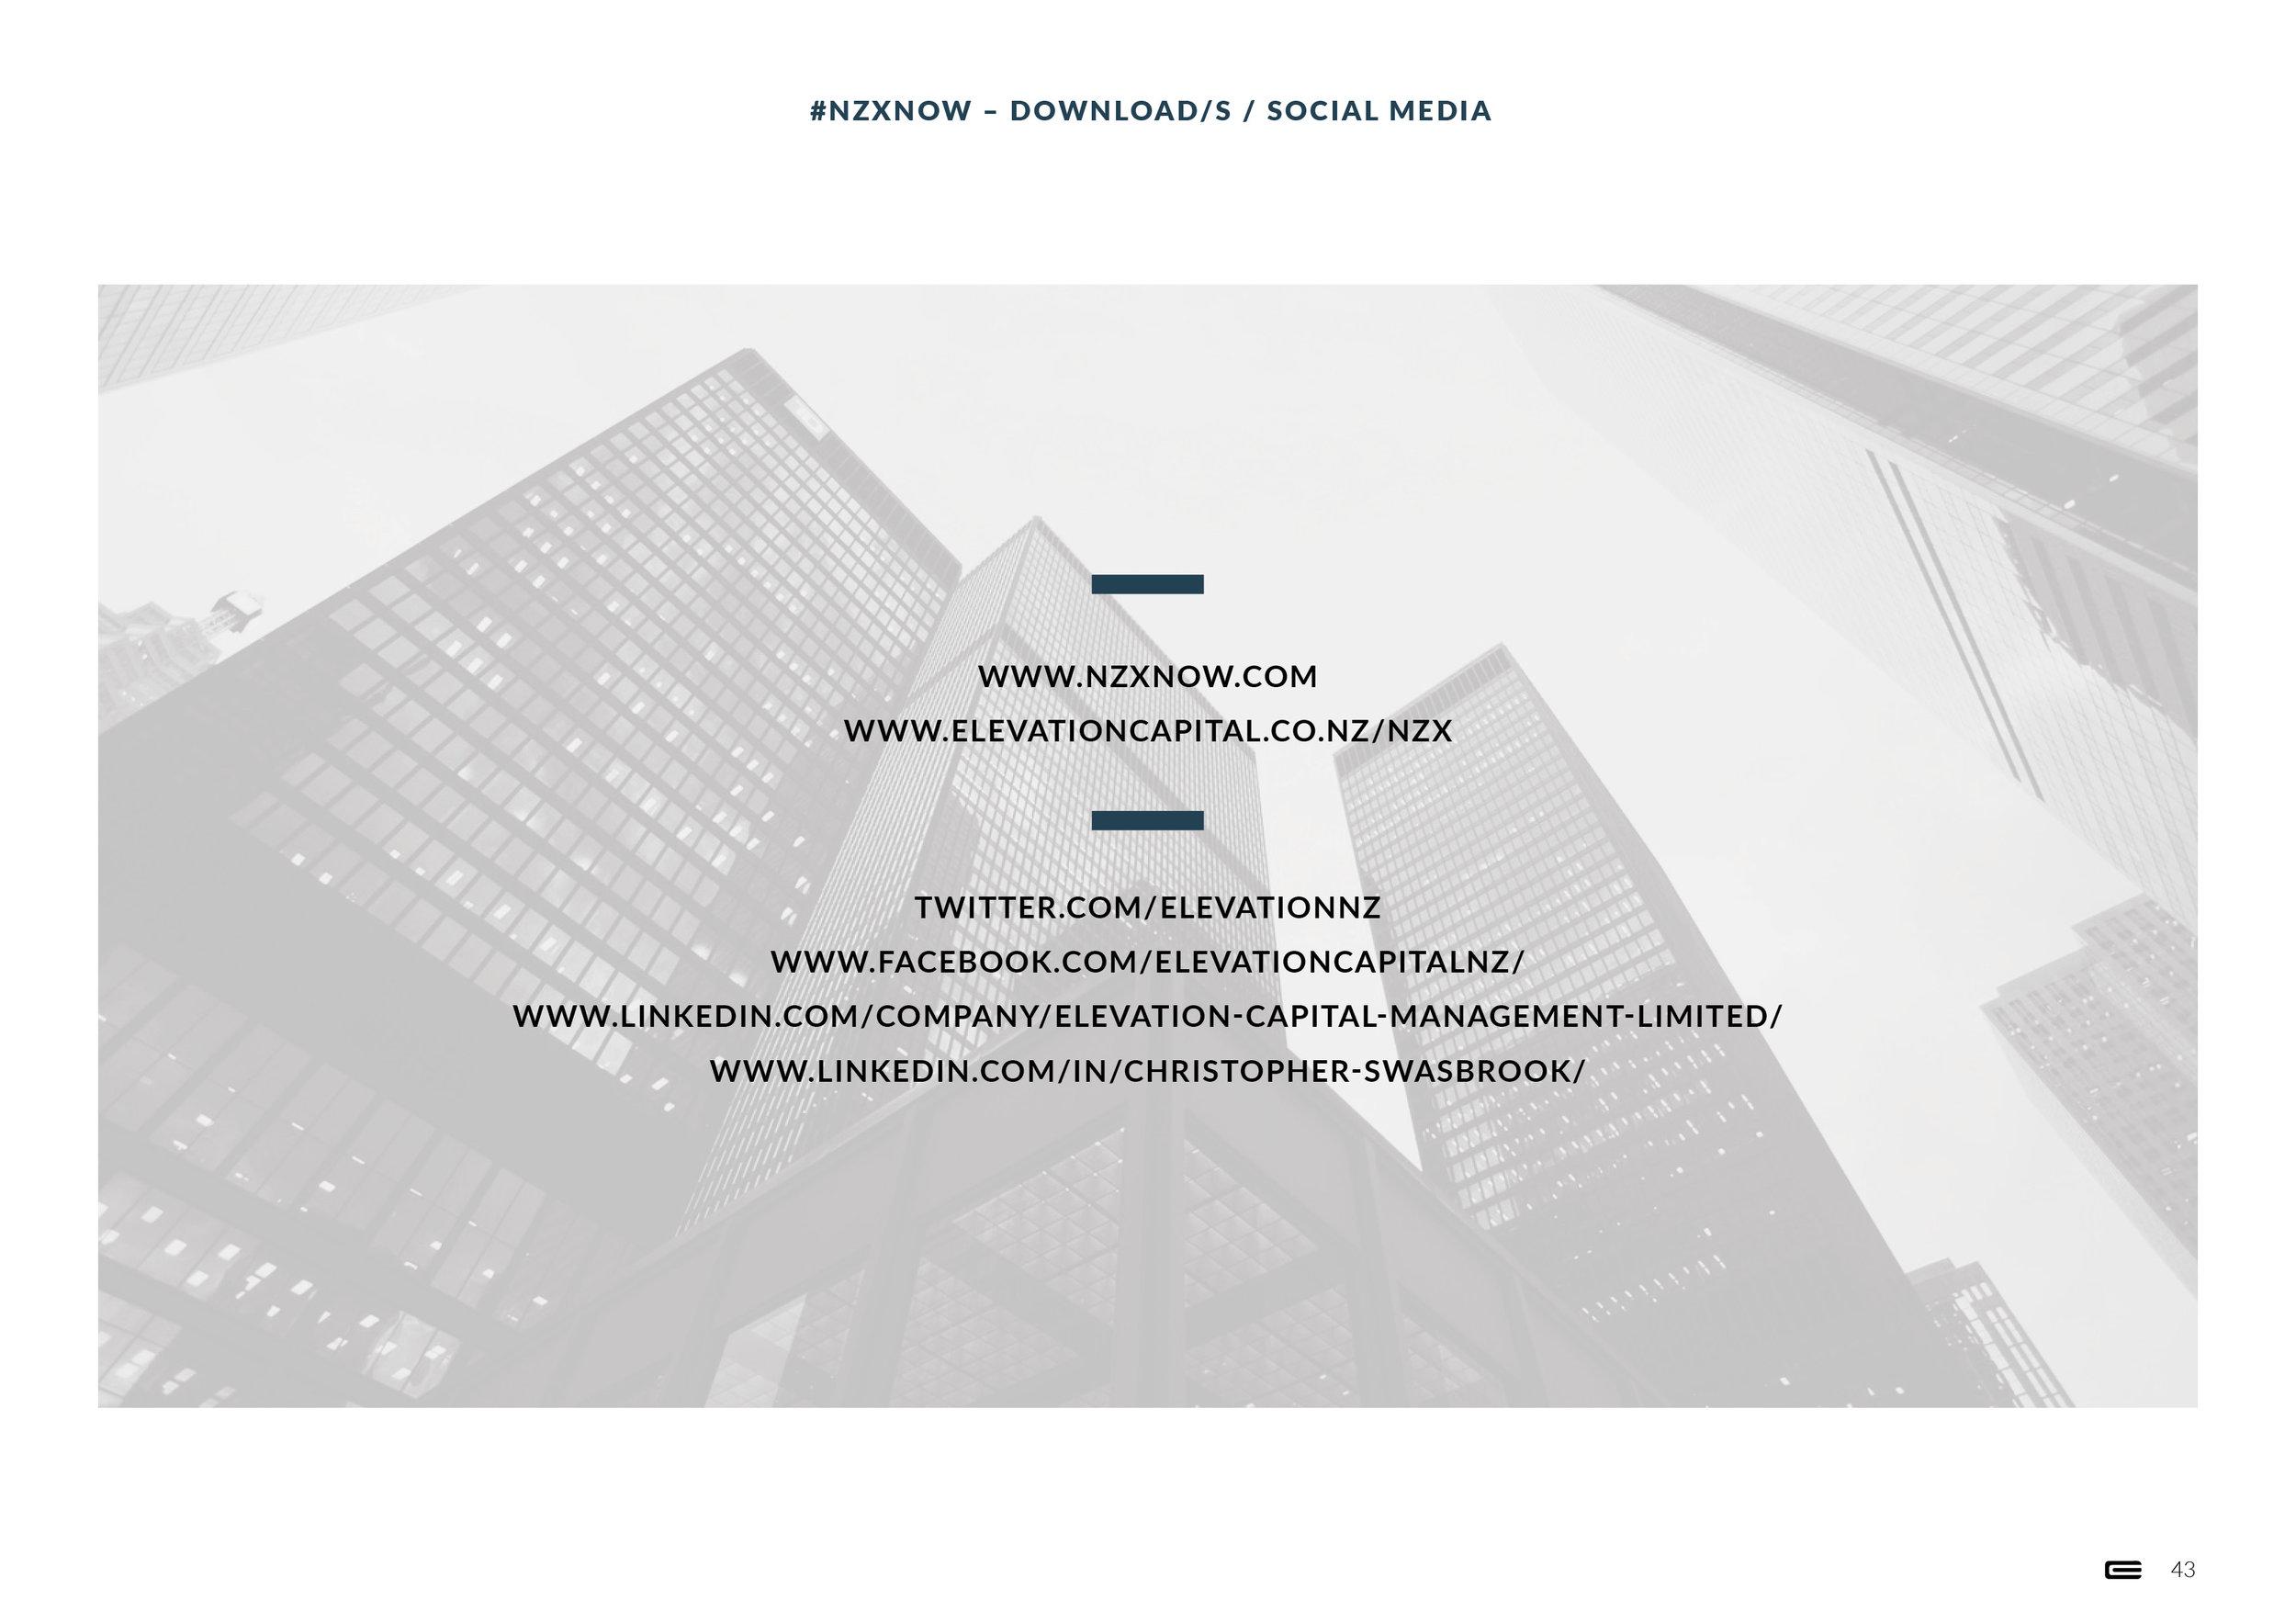 #NZXNOW - Presentation - 1 October 201843.jpg